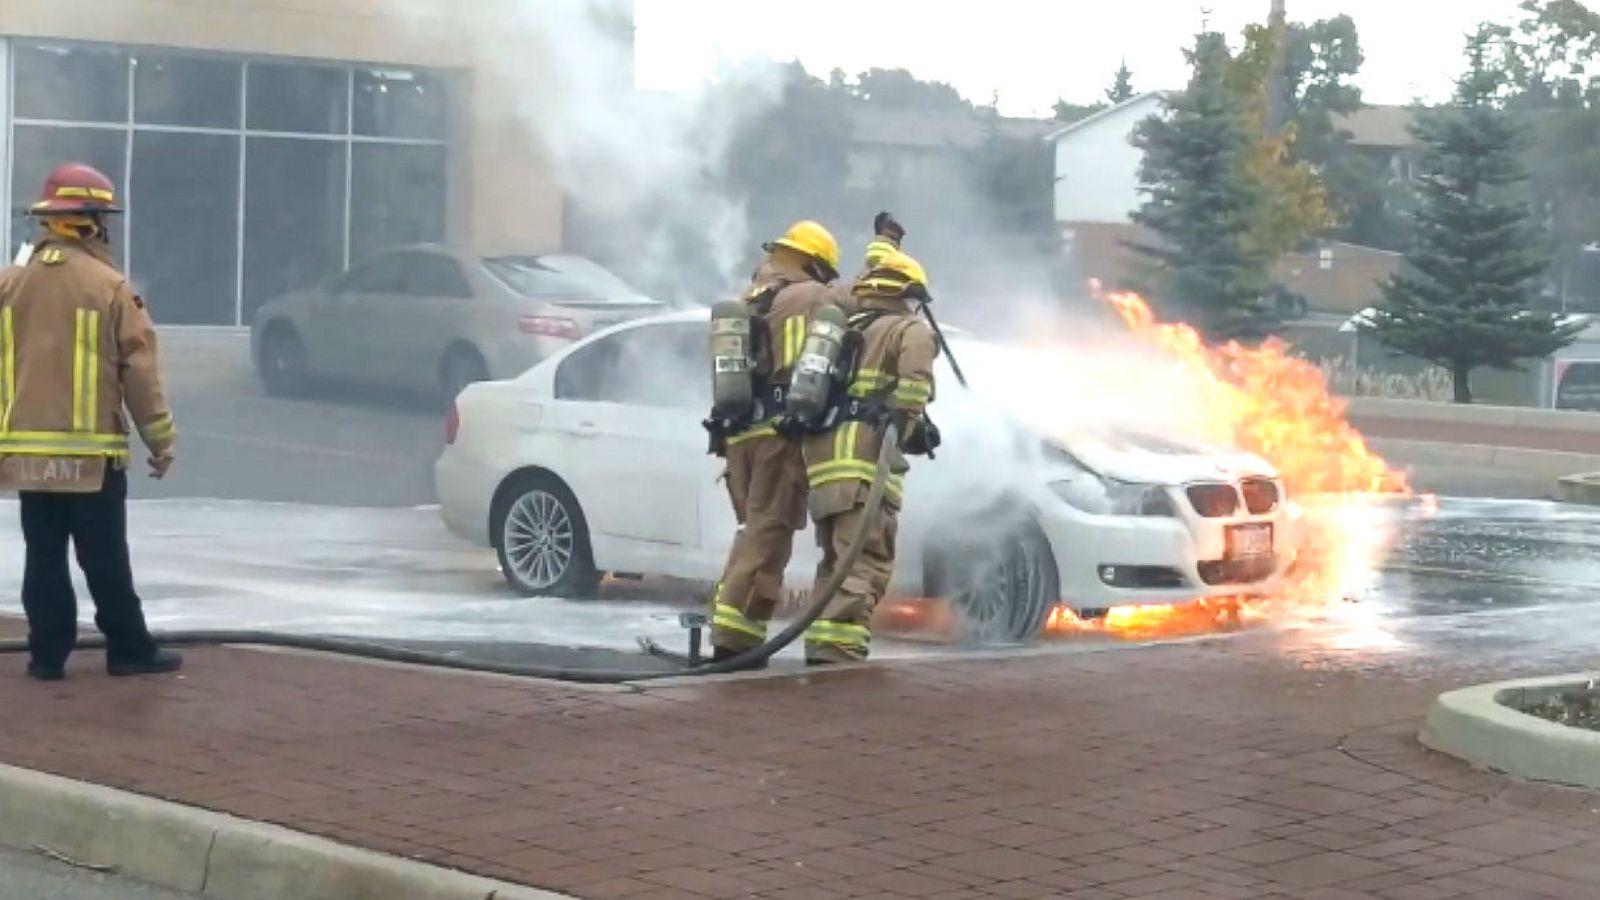 Bmw Recalls 1 Million Vehicles For Fire Risk Abc News Fire Pump Box Car  Fuse Box Caught Fire